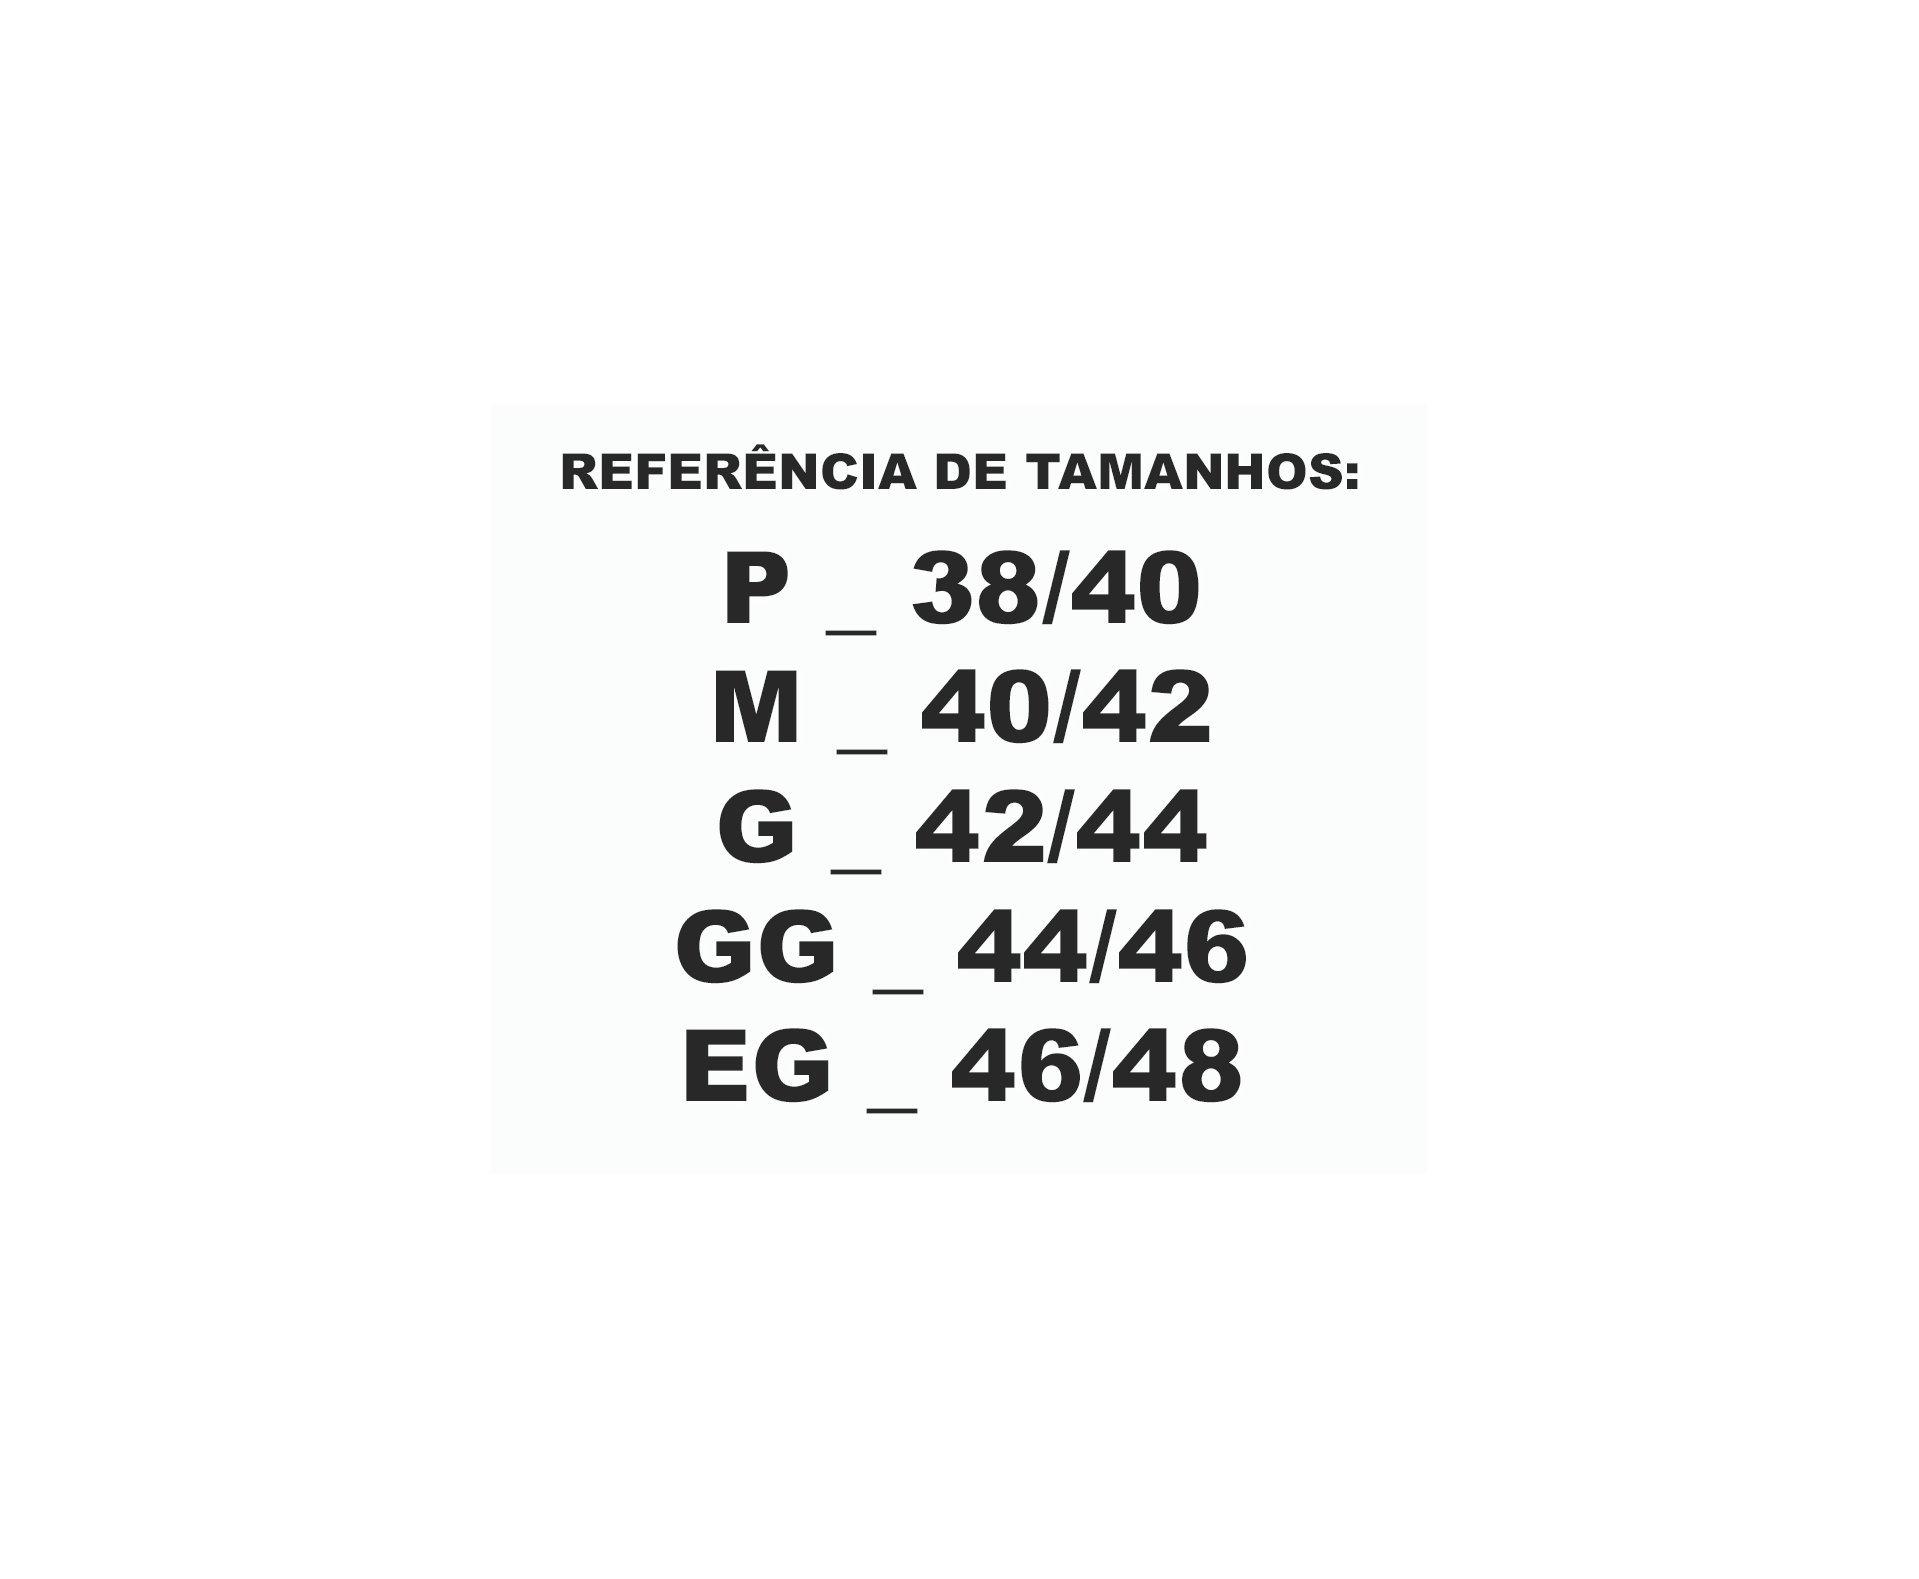 Calça Forhonor 911 Olive Drab - Tatica, Militar, Airsoft, Ripstop - P